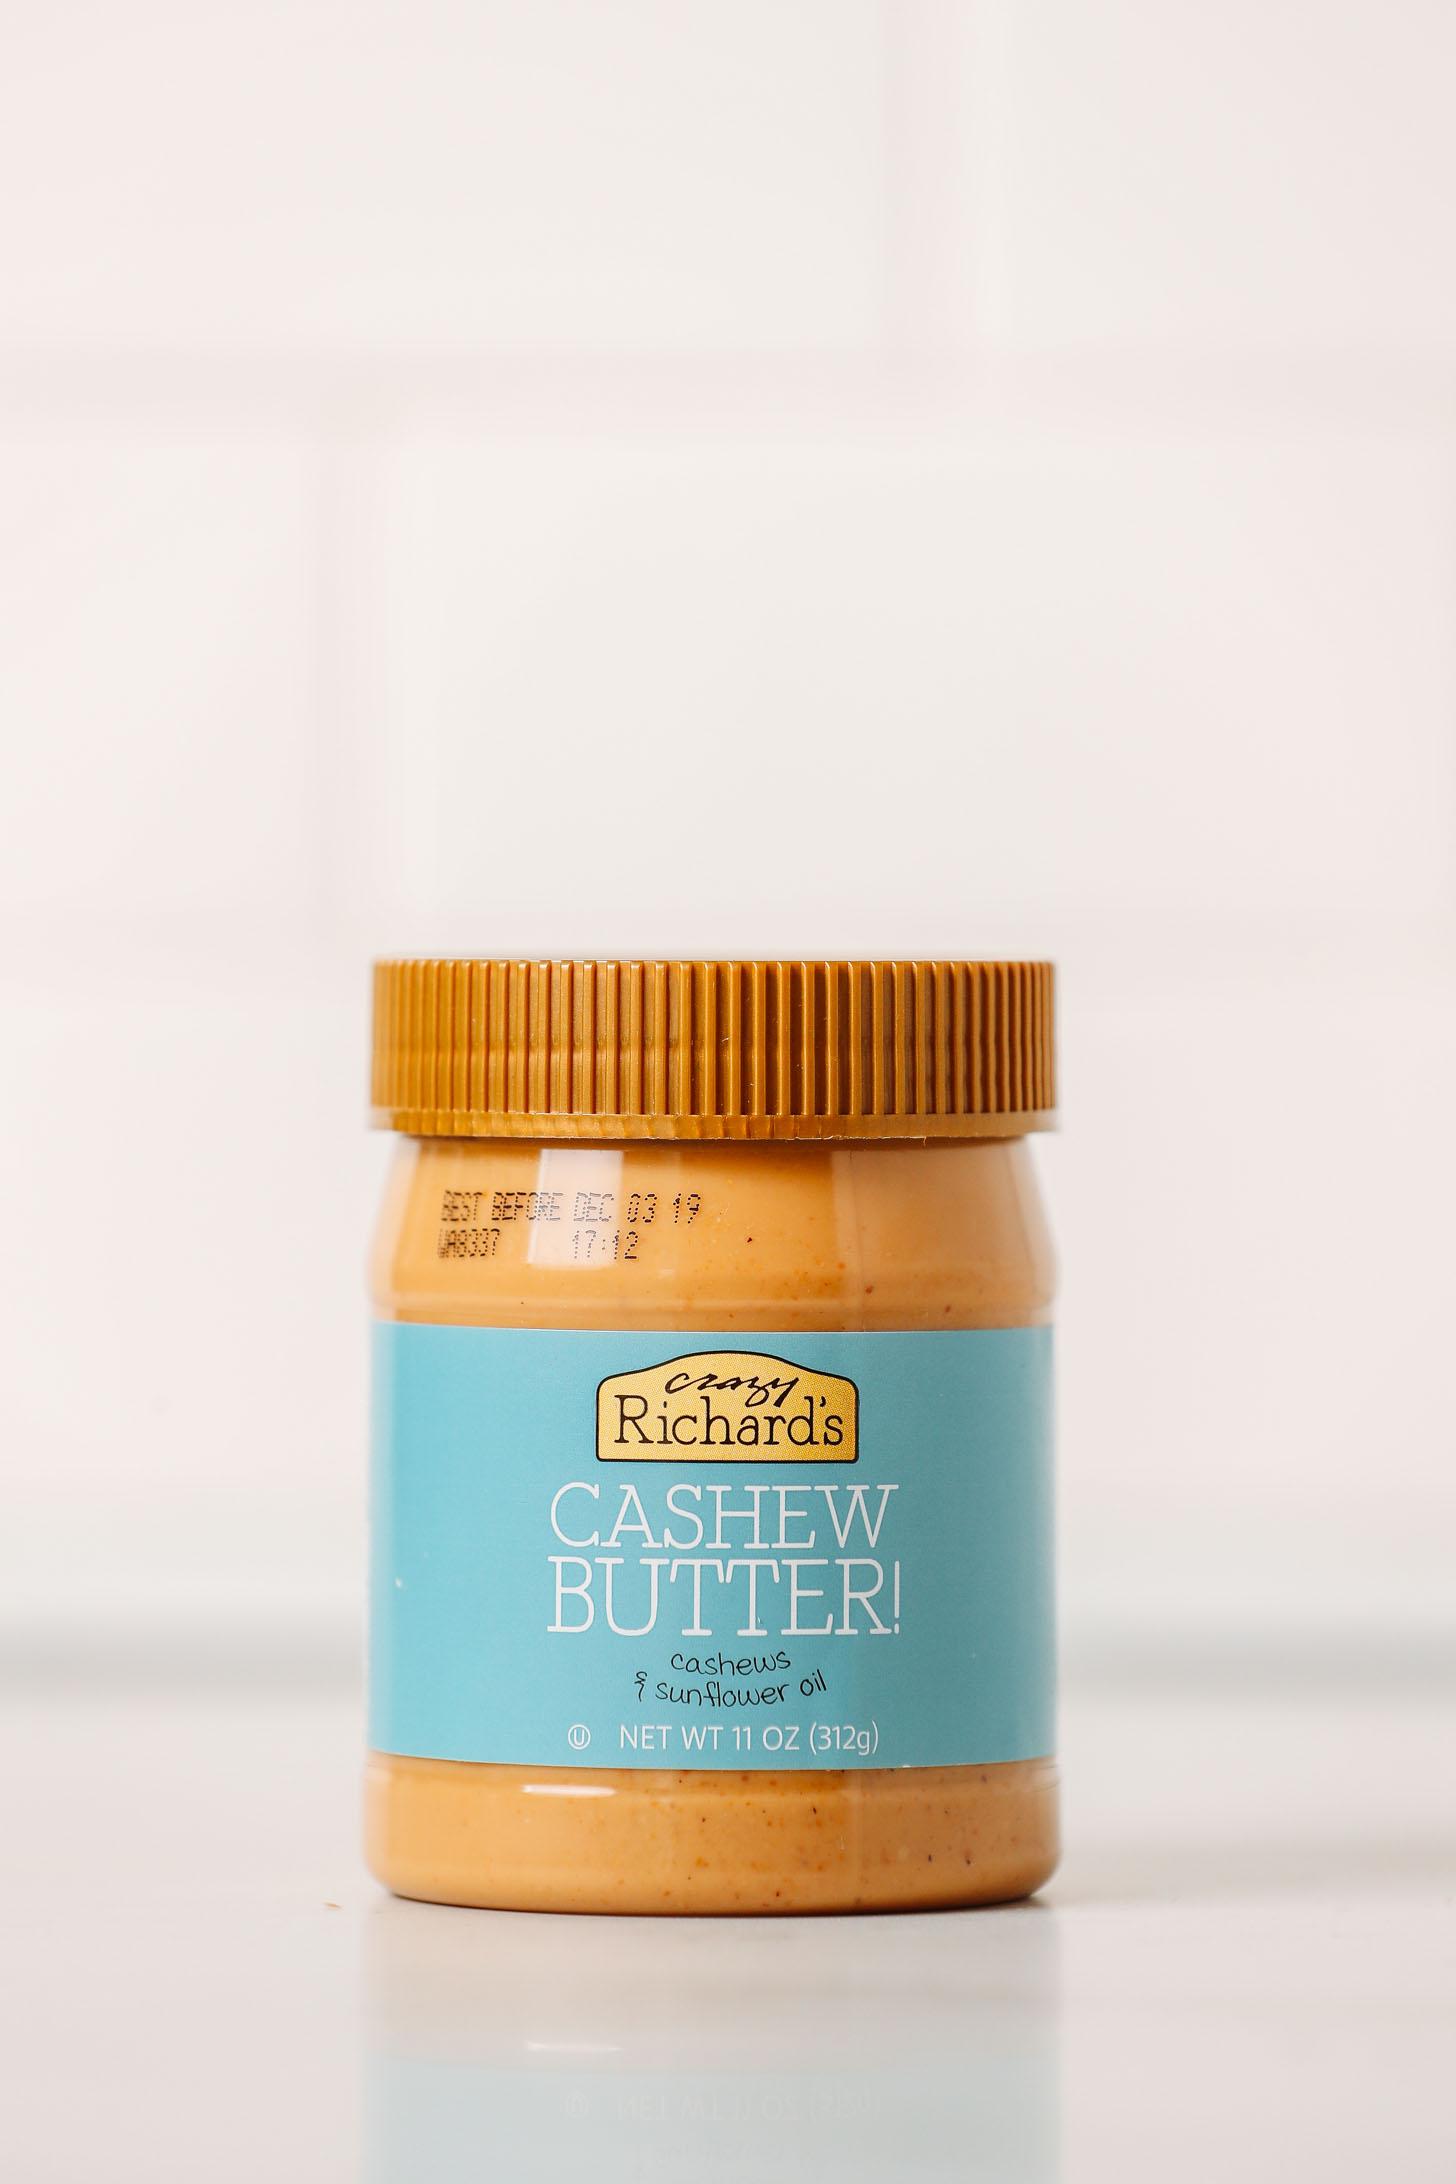 Jar of Crazy Richard's Cashew Butter as part of our cashew butter brands review